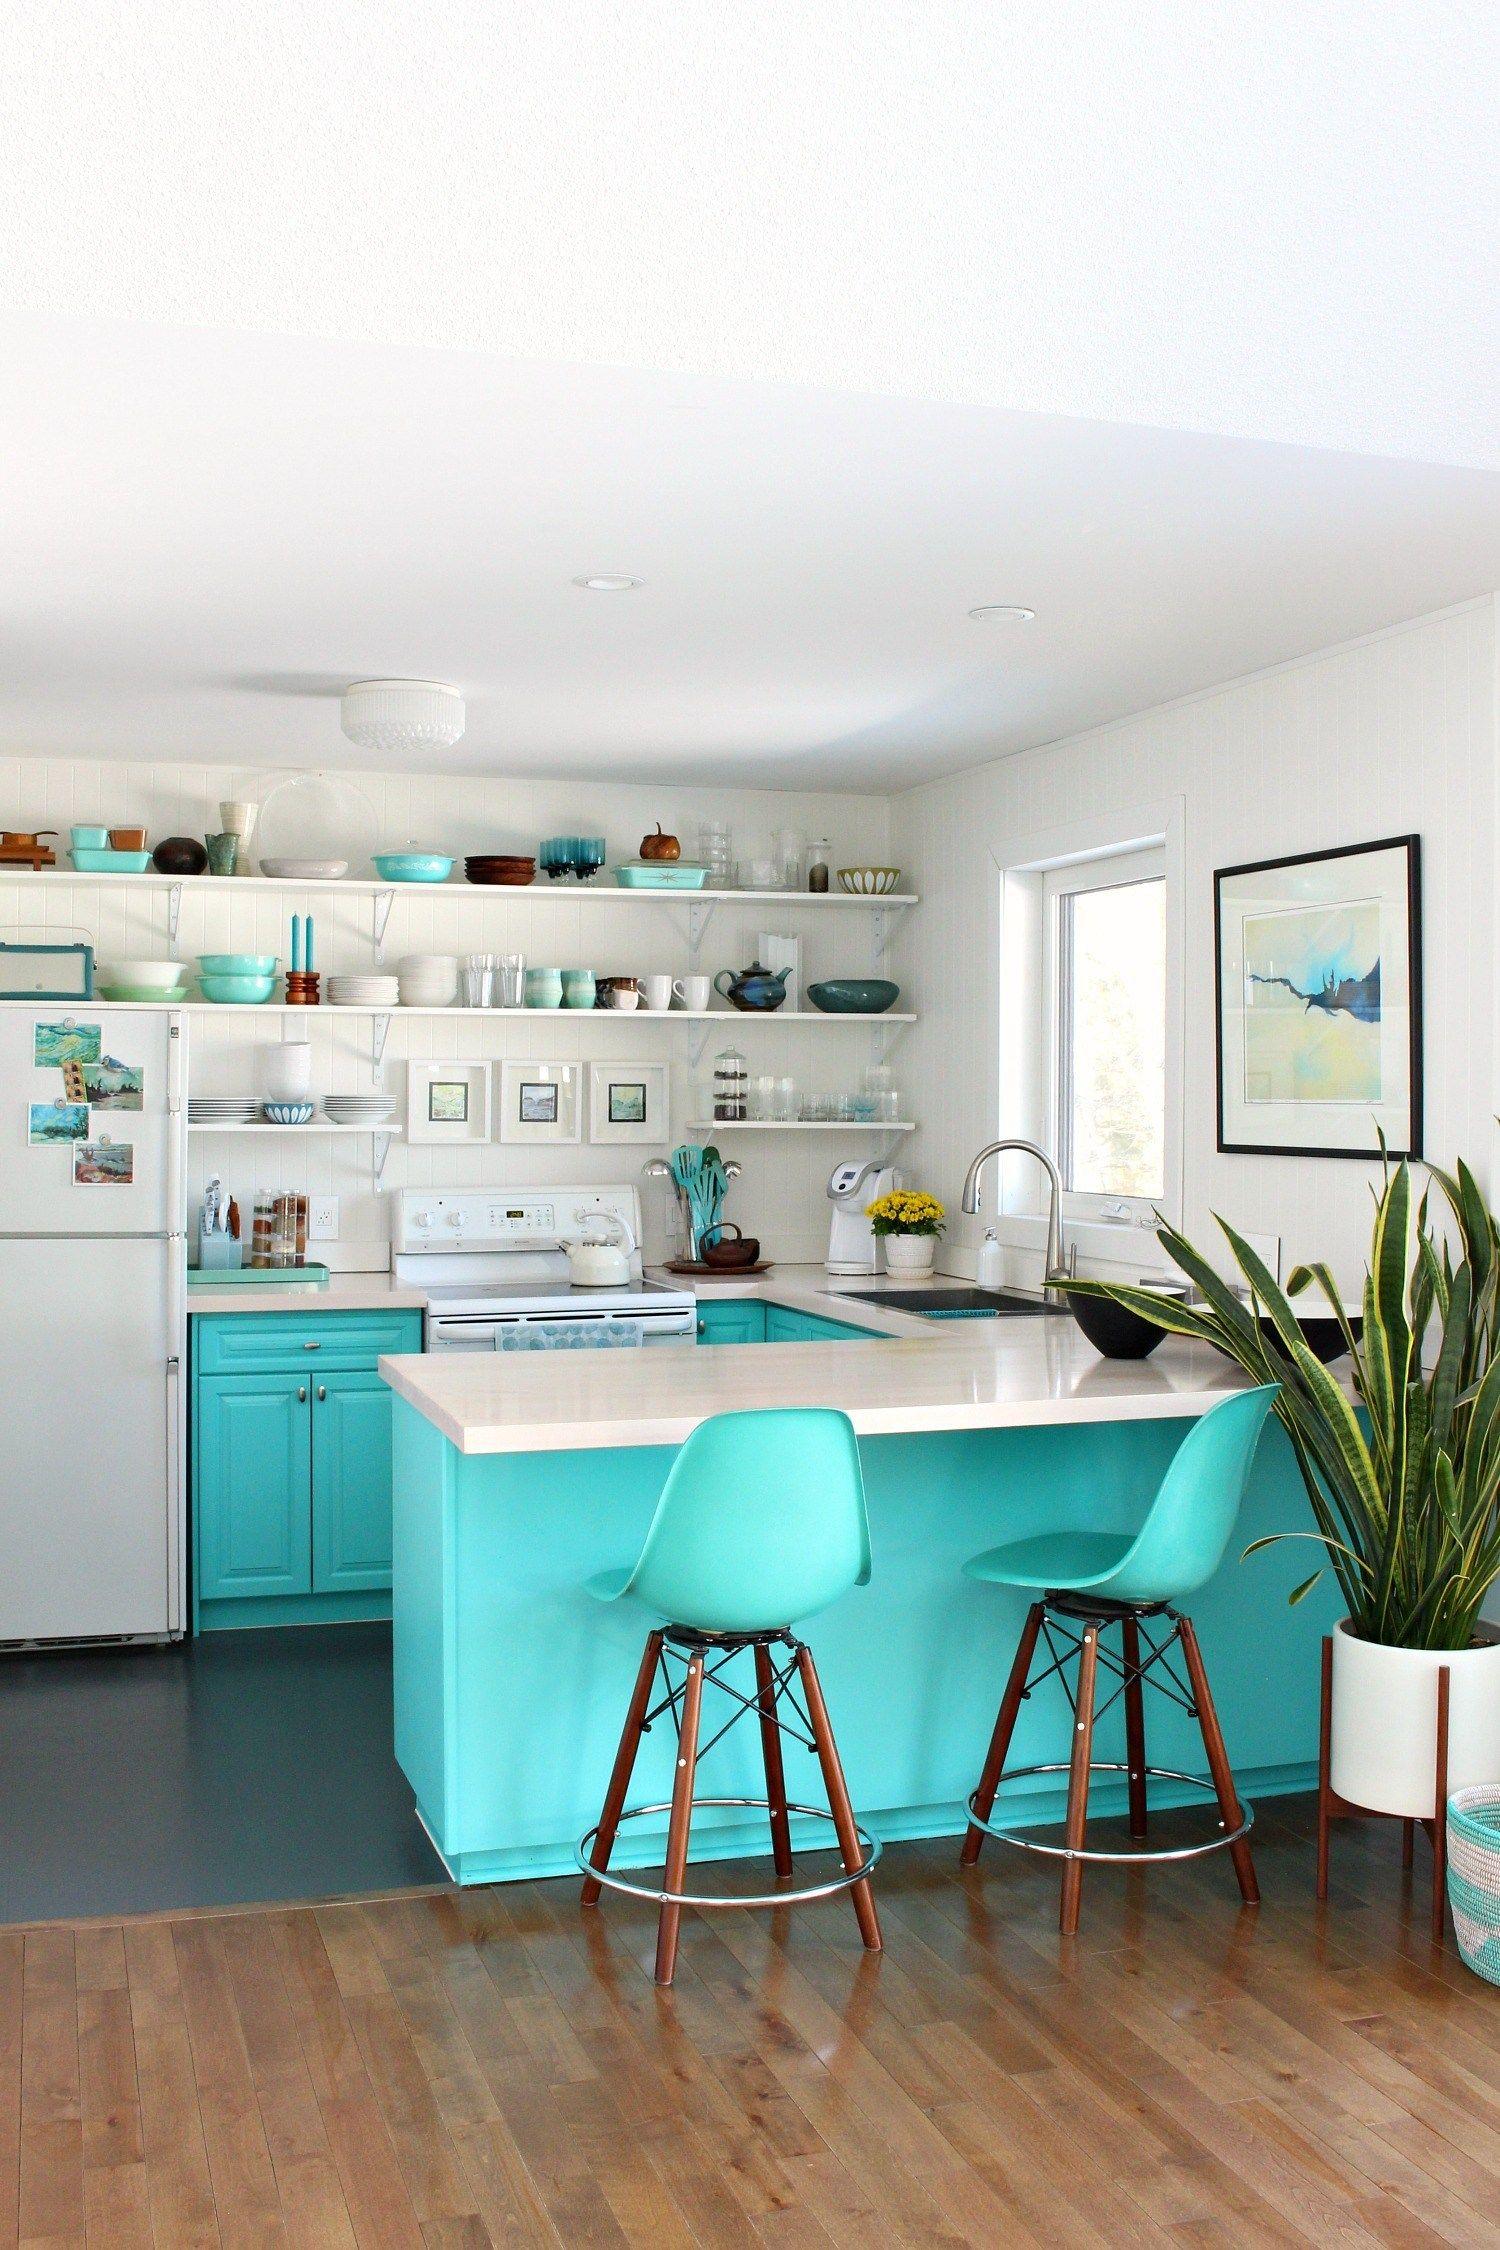 Simple Spring Home Tour Dans Le Lakehouse Kitchen Inspiration Design Lake House Kitchen Open Shelving Kitchen Cabinets